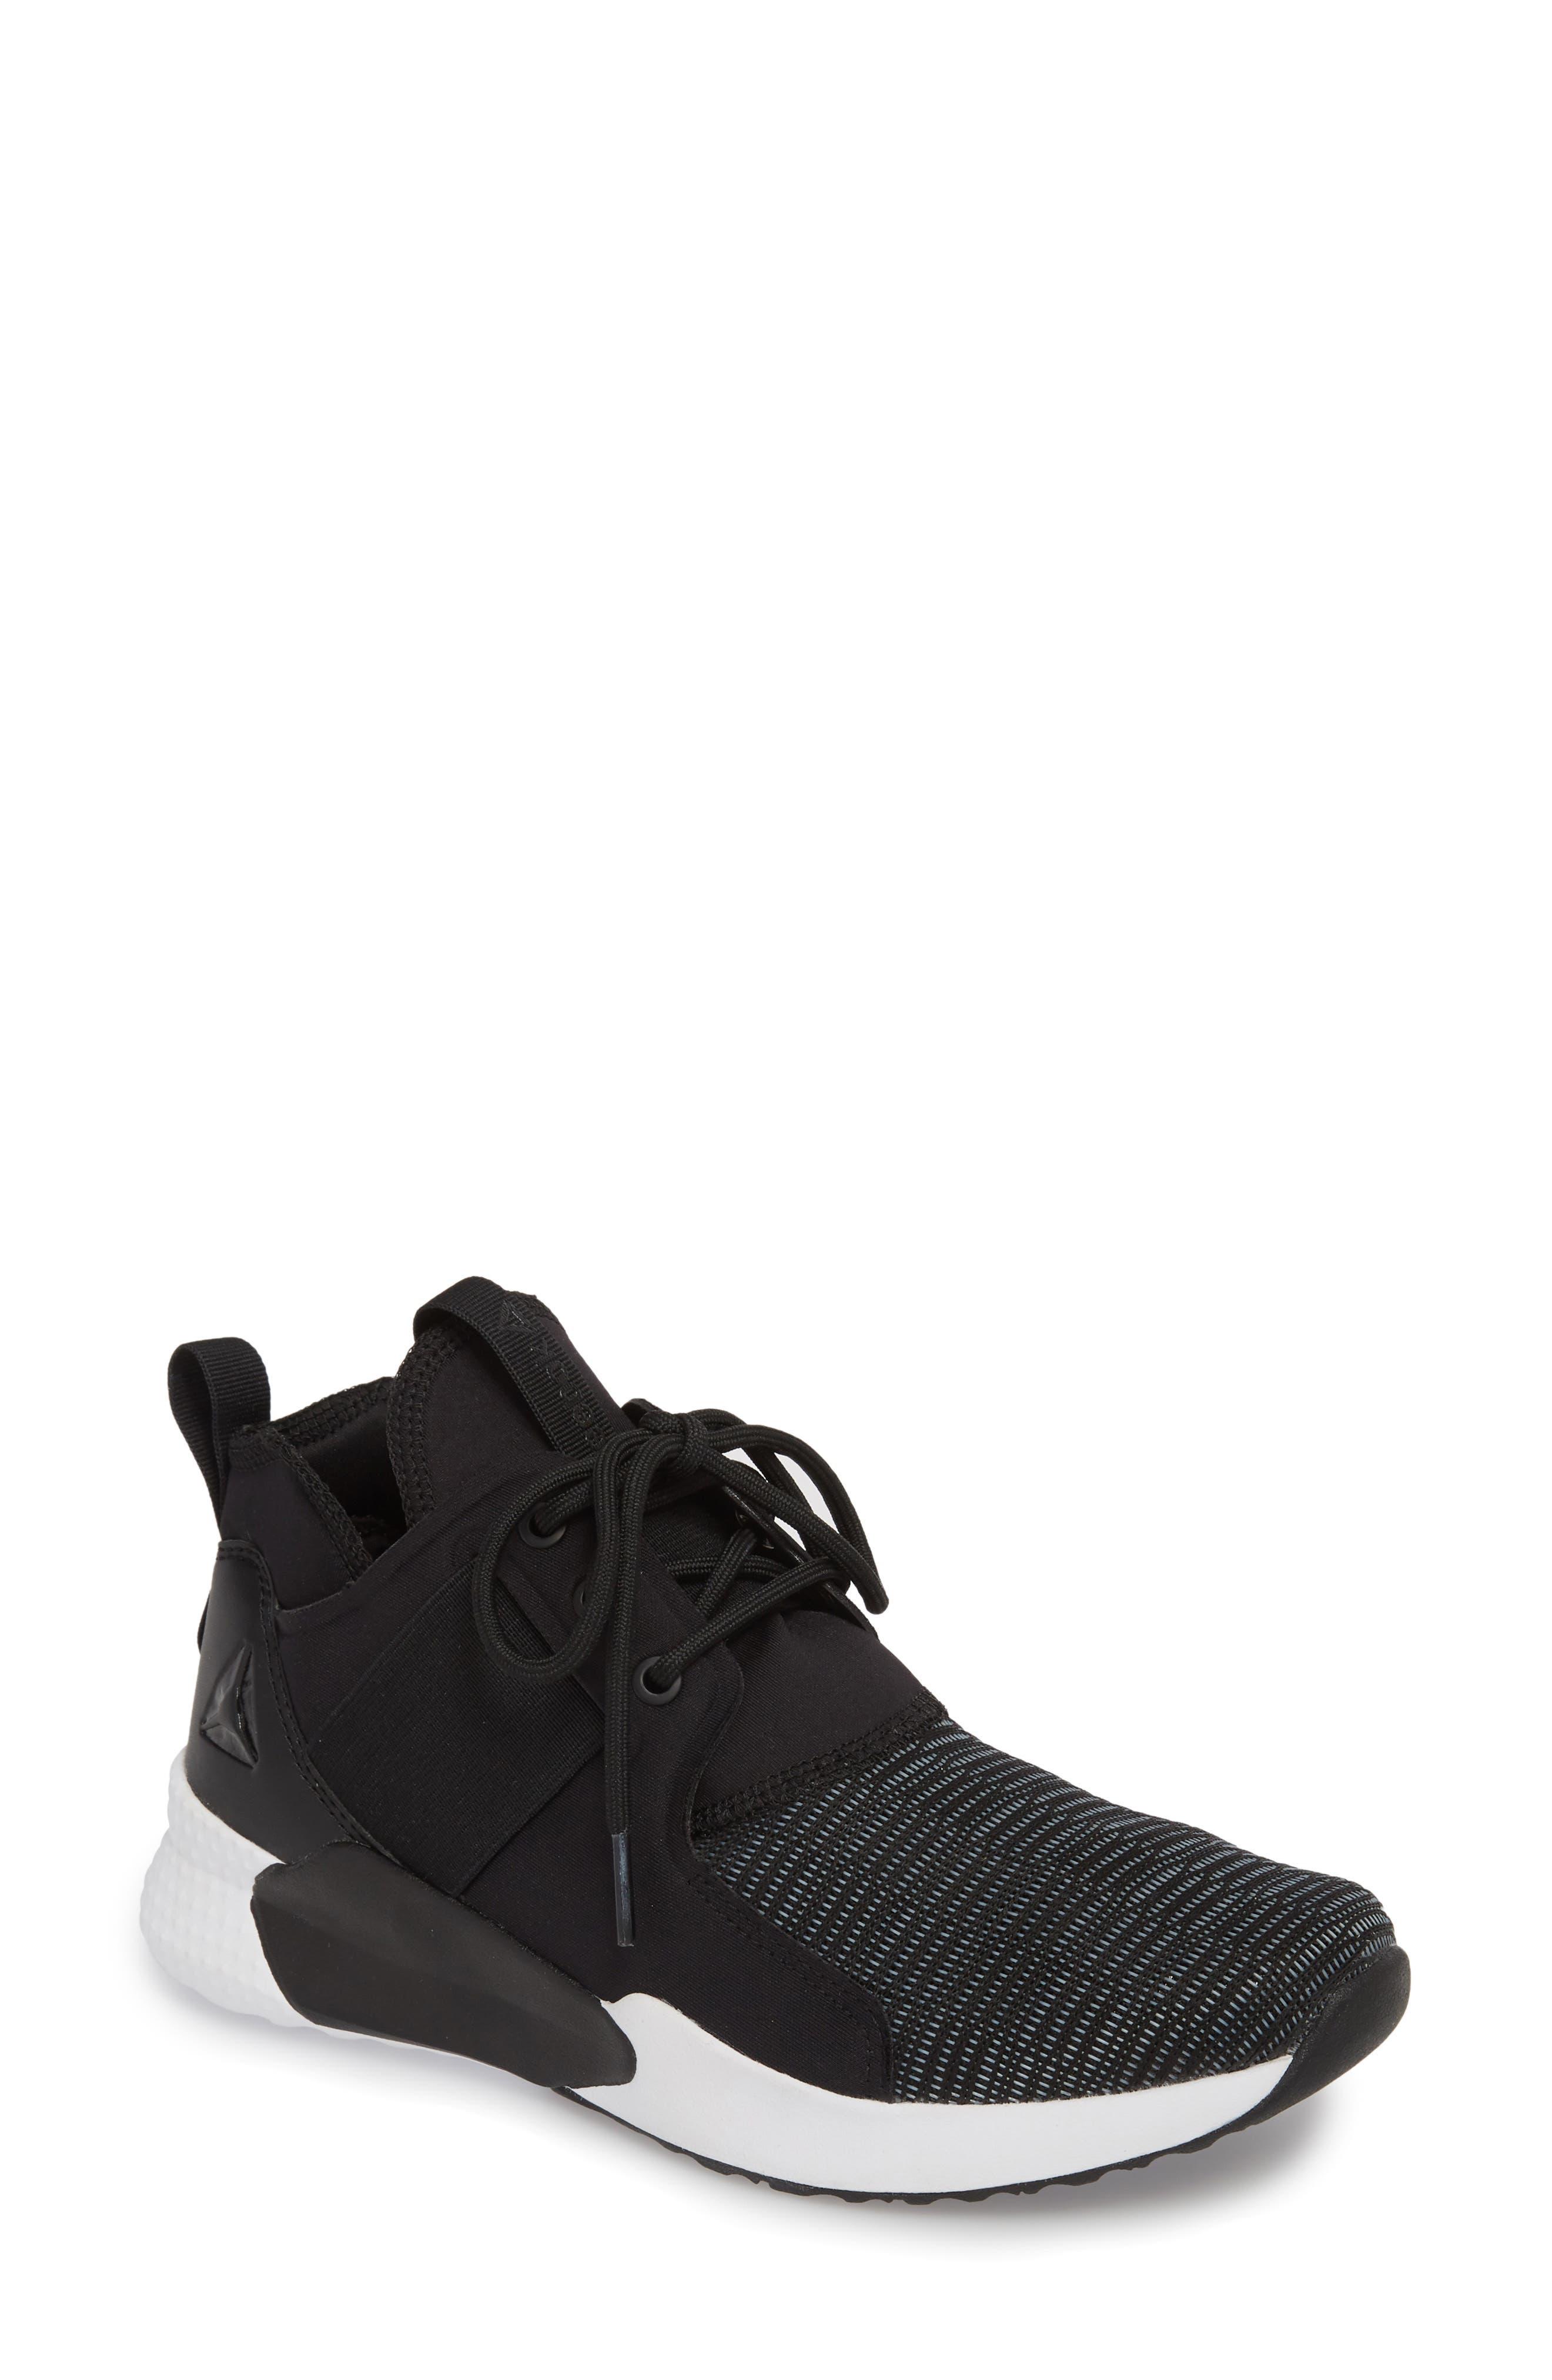 Guresu 1.0 High Top Sneaker,                         Main,                         color, Black/ White